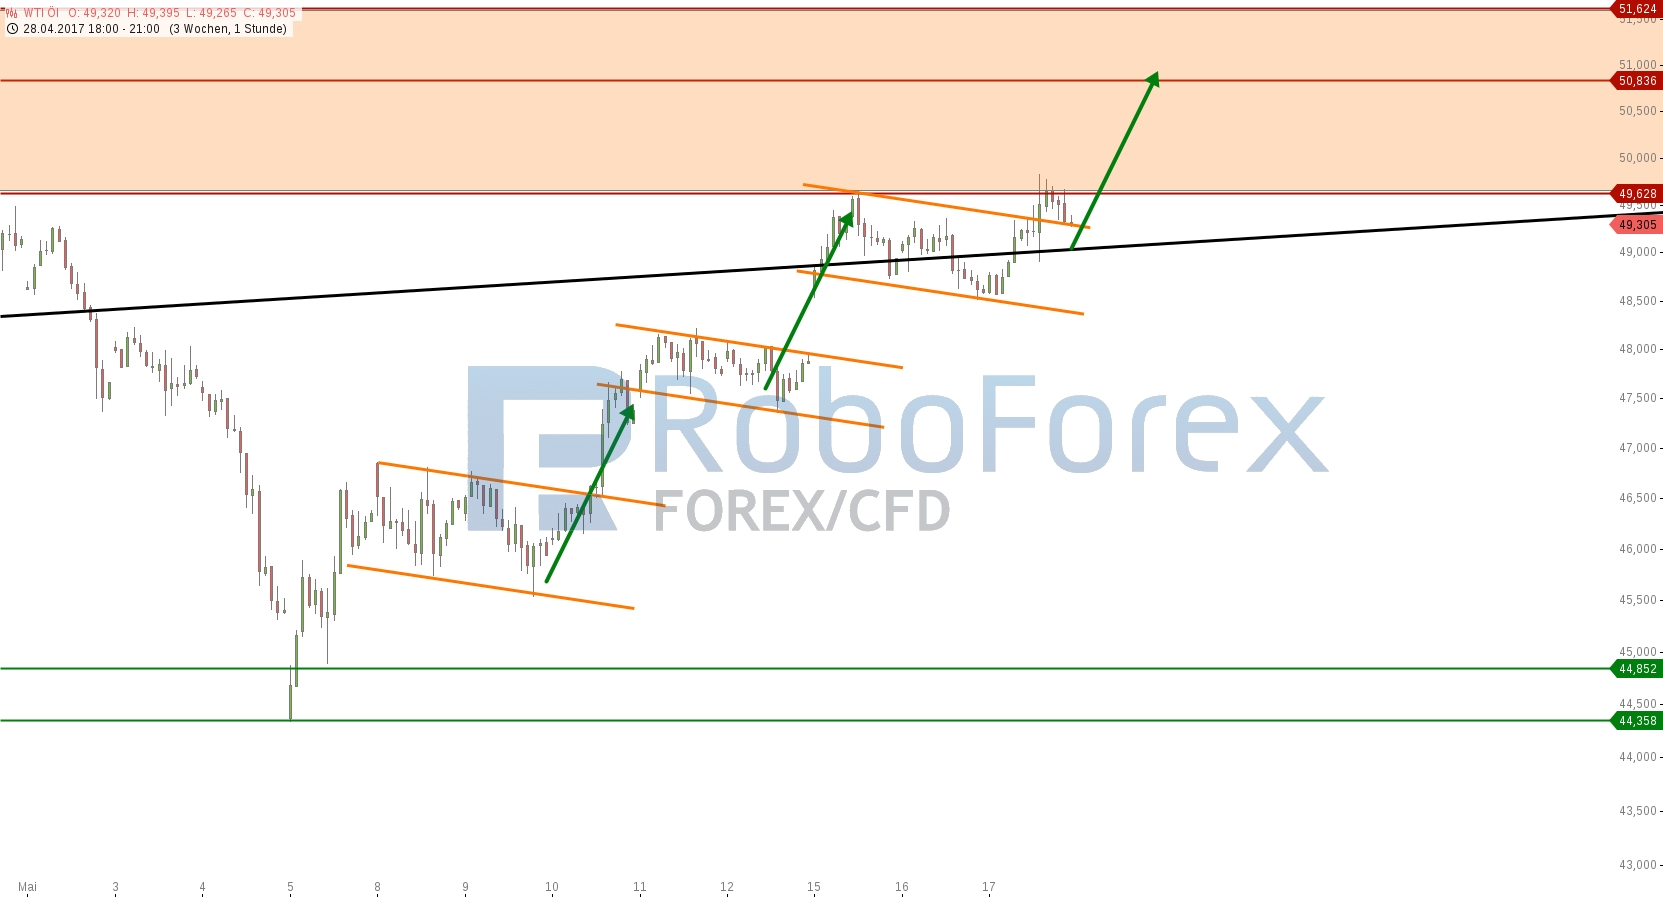 chart-17052017-2242-wtil-roboforex.jpg